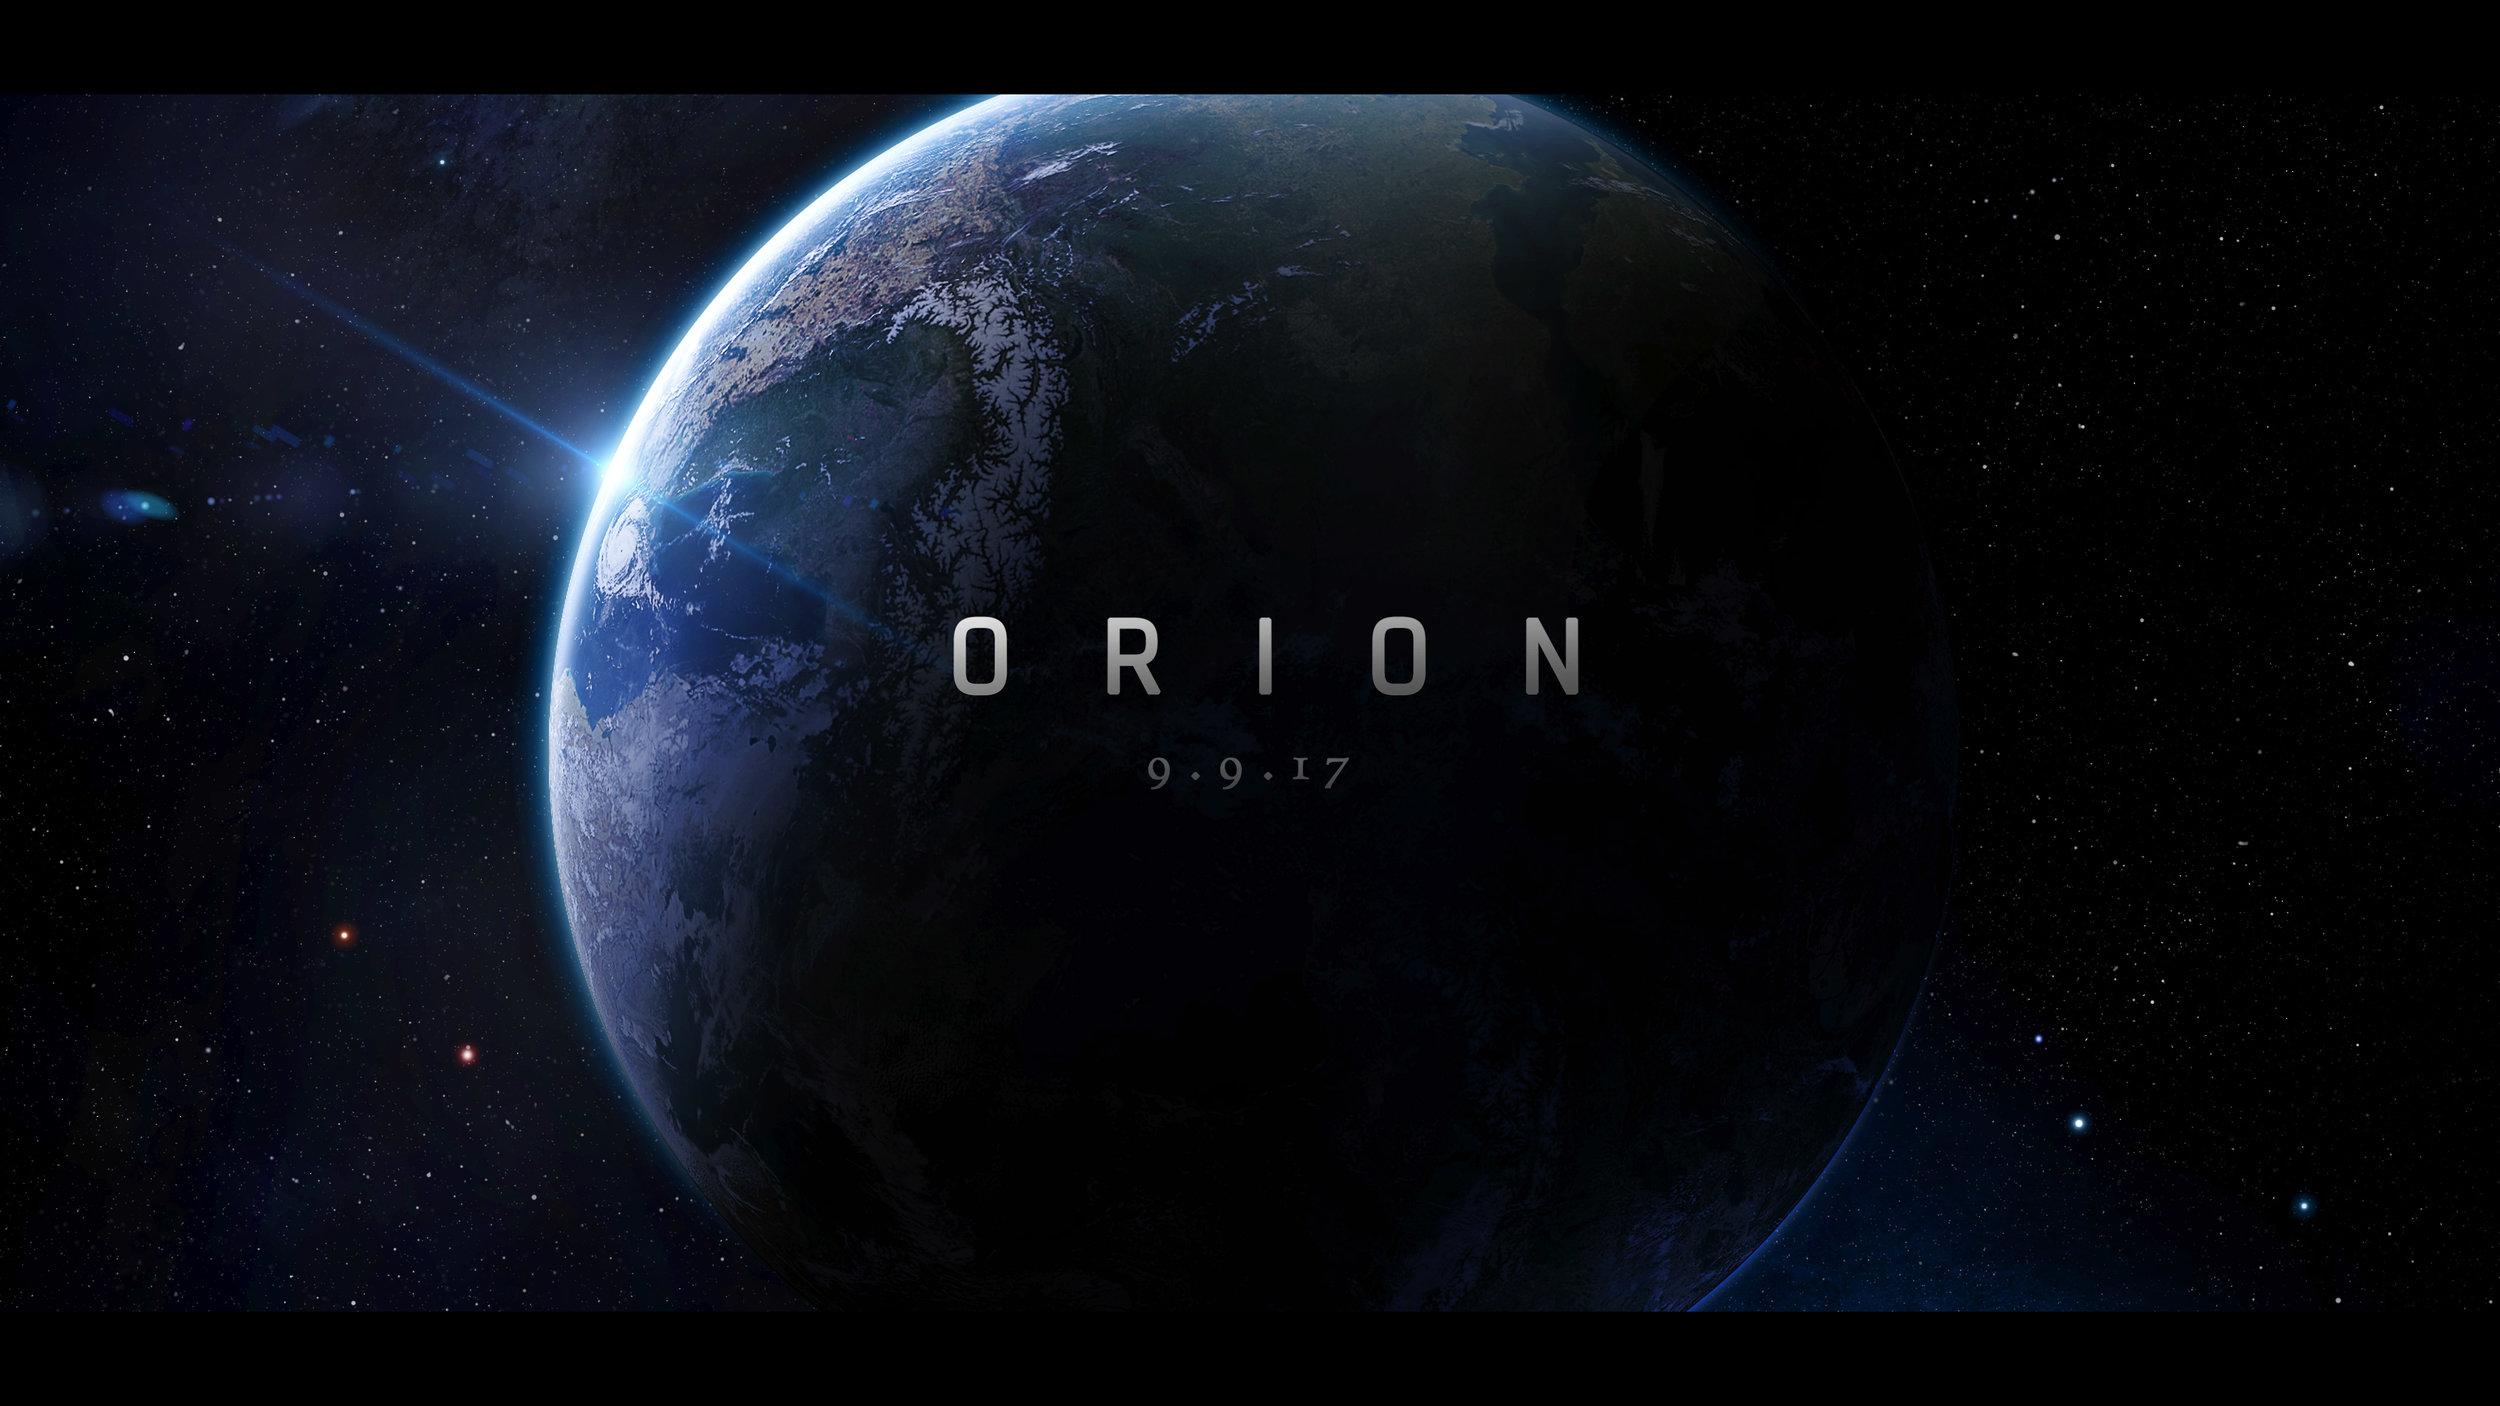 Orion_BluePlanet_ComingSoon_3.jpg